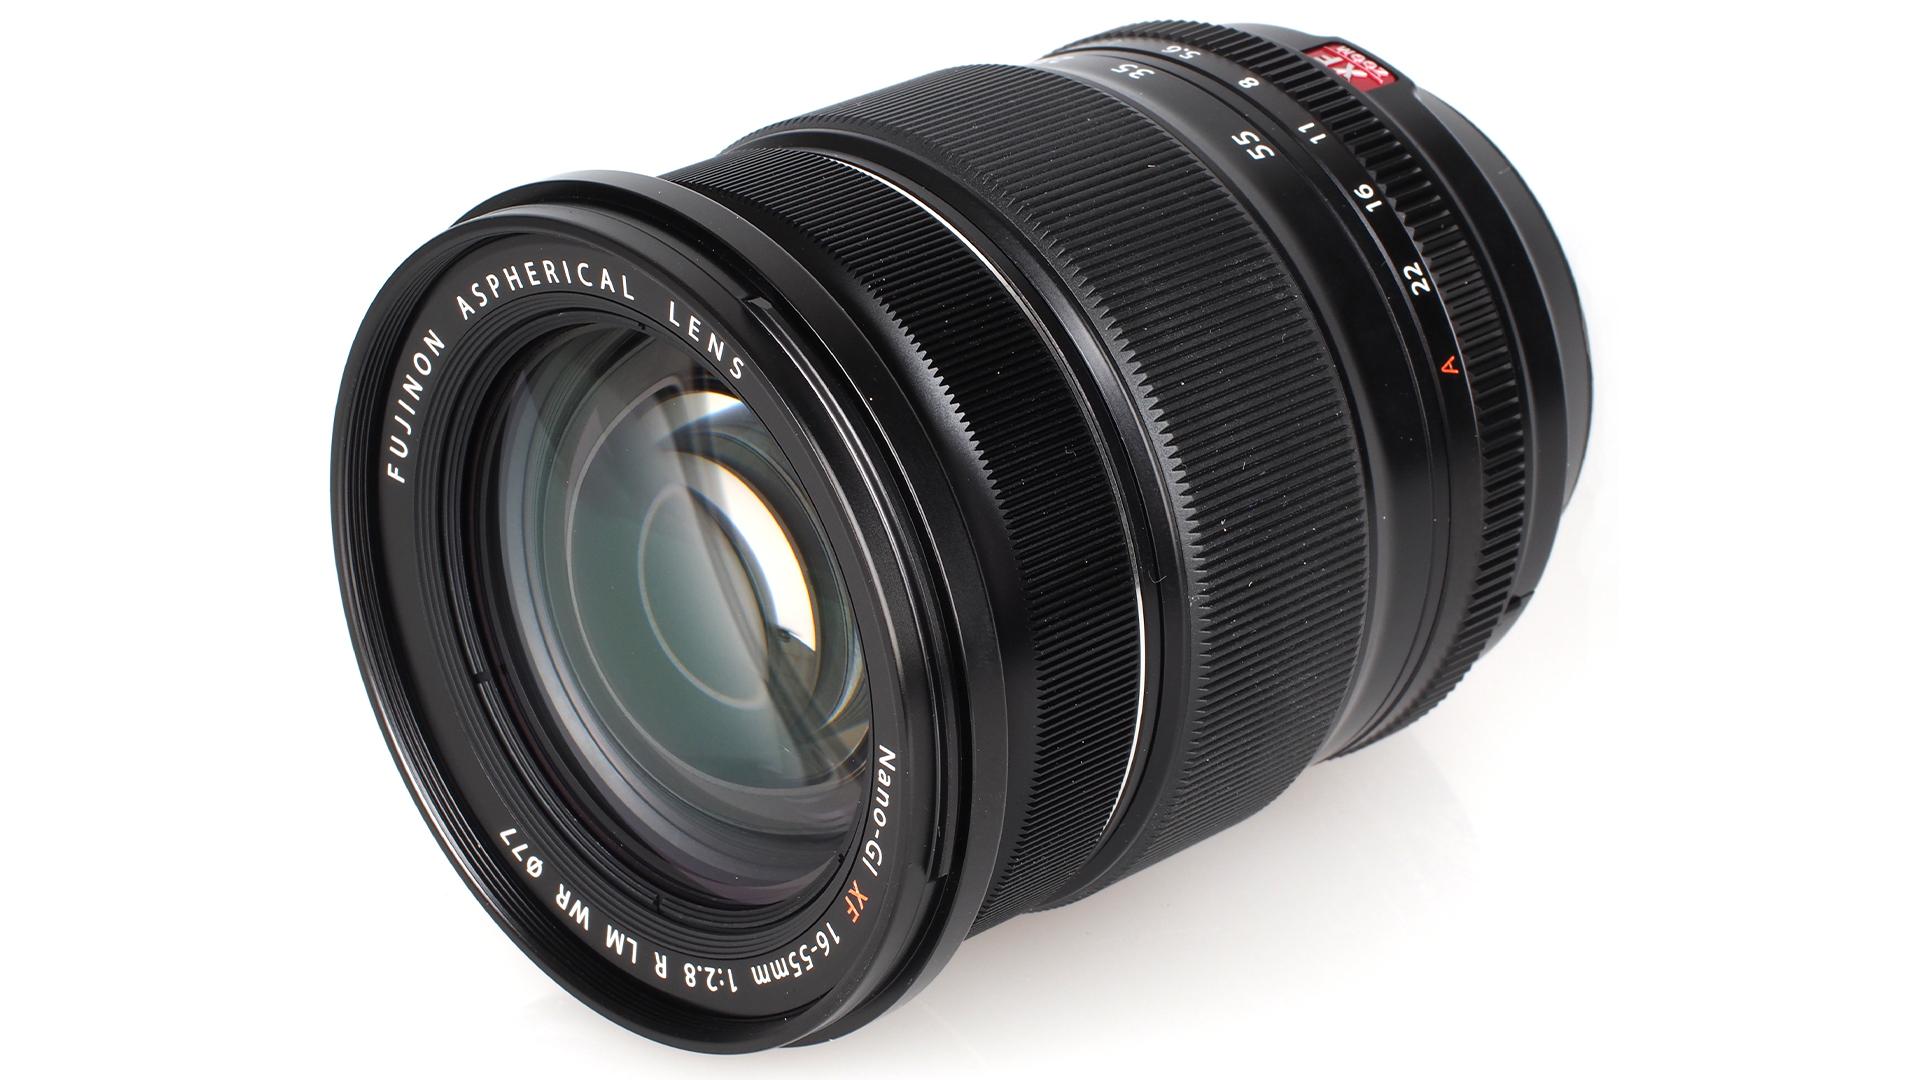 Fuji XF 16-55mm F2.8 - Fujifilm's Red Badge Mid Range Zoom